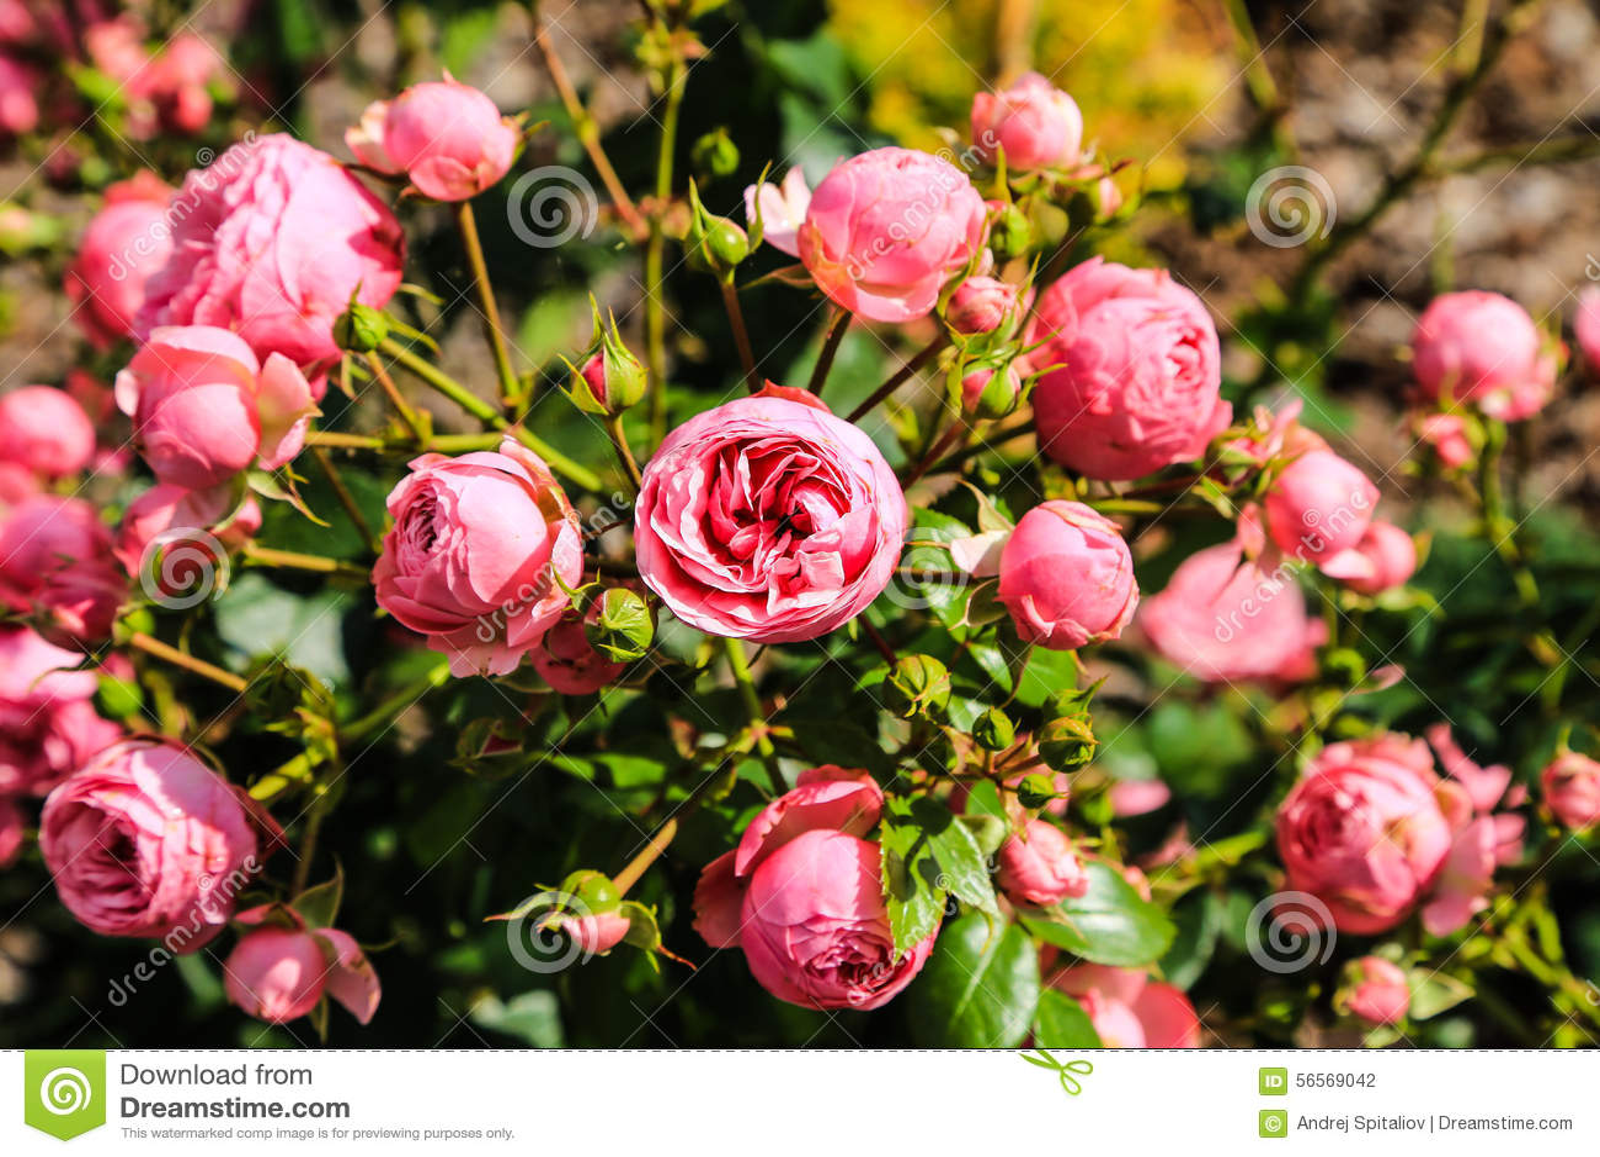 Download Τομέας των ρόδινων τριαντάφυλλων (Rosaceae) Στοκ Εικόνες - εικόνα από ανασκόπησης, κόκκινος: 56569042